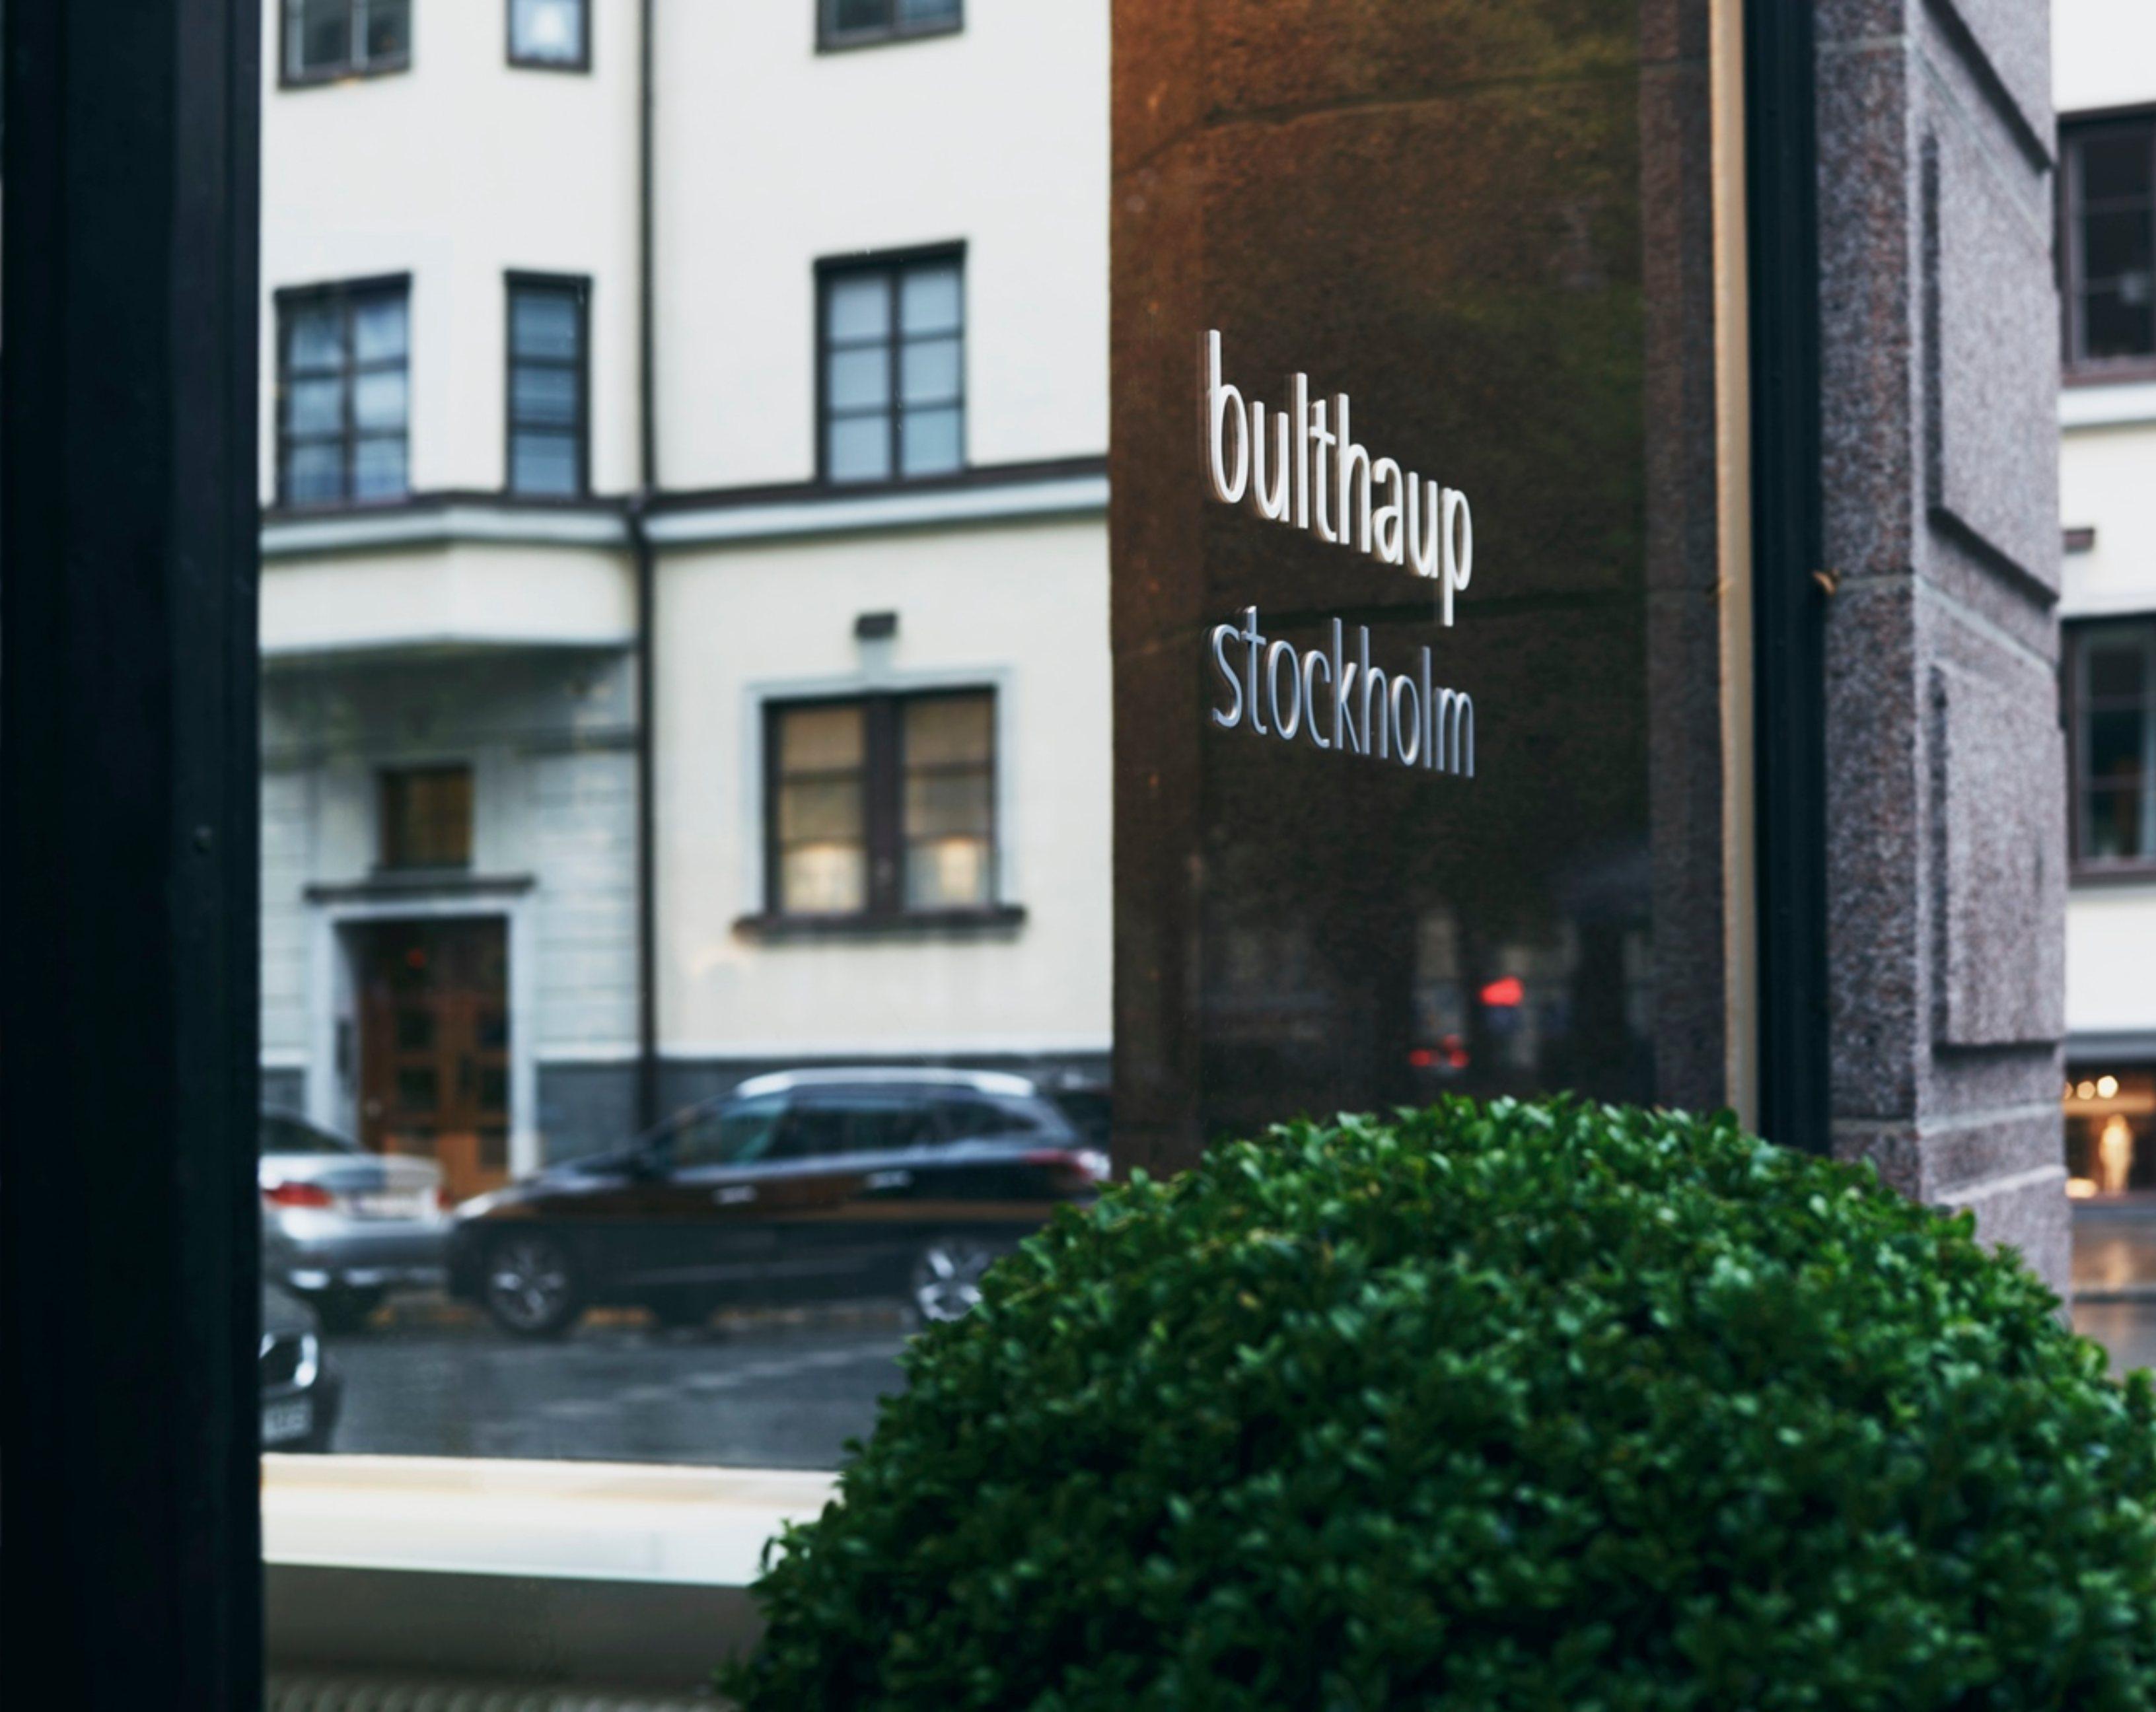 bulthaup-stockholm-butik